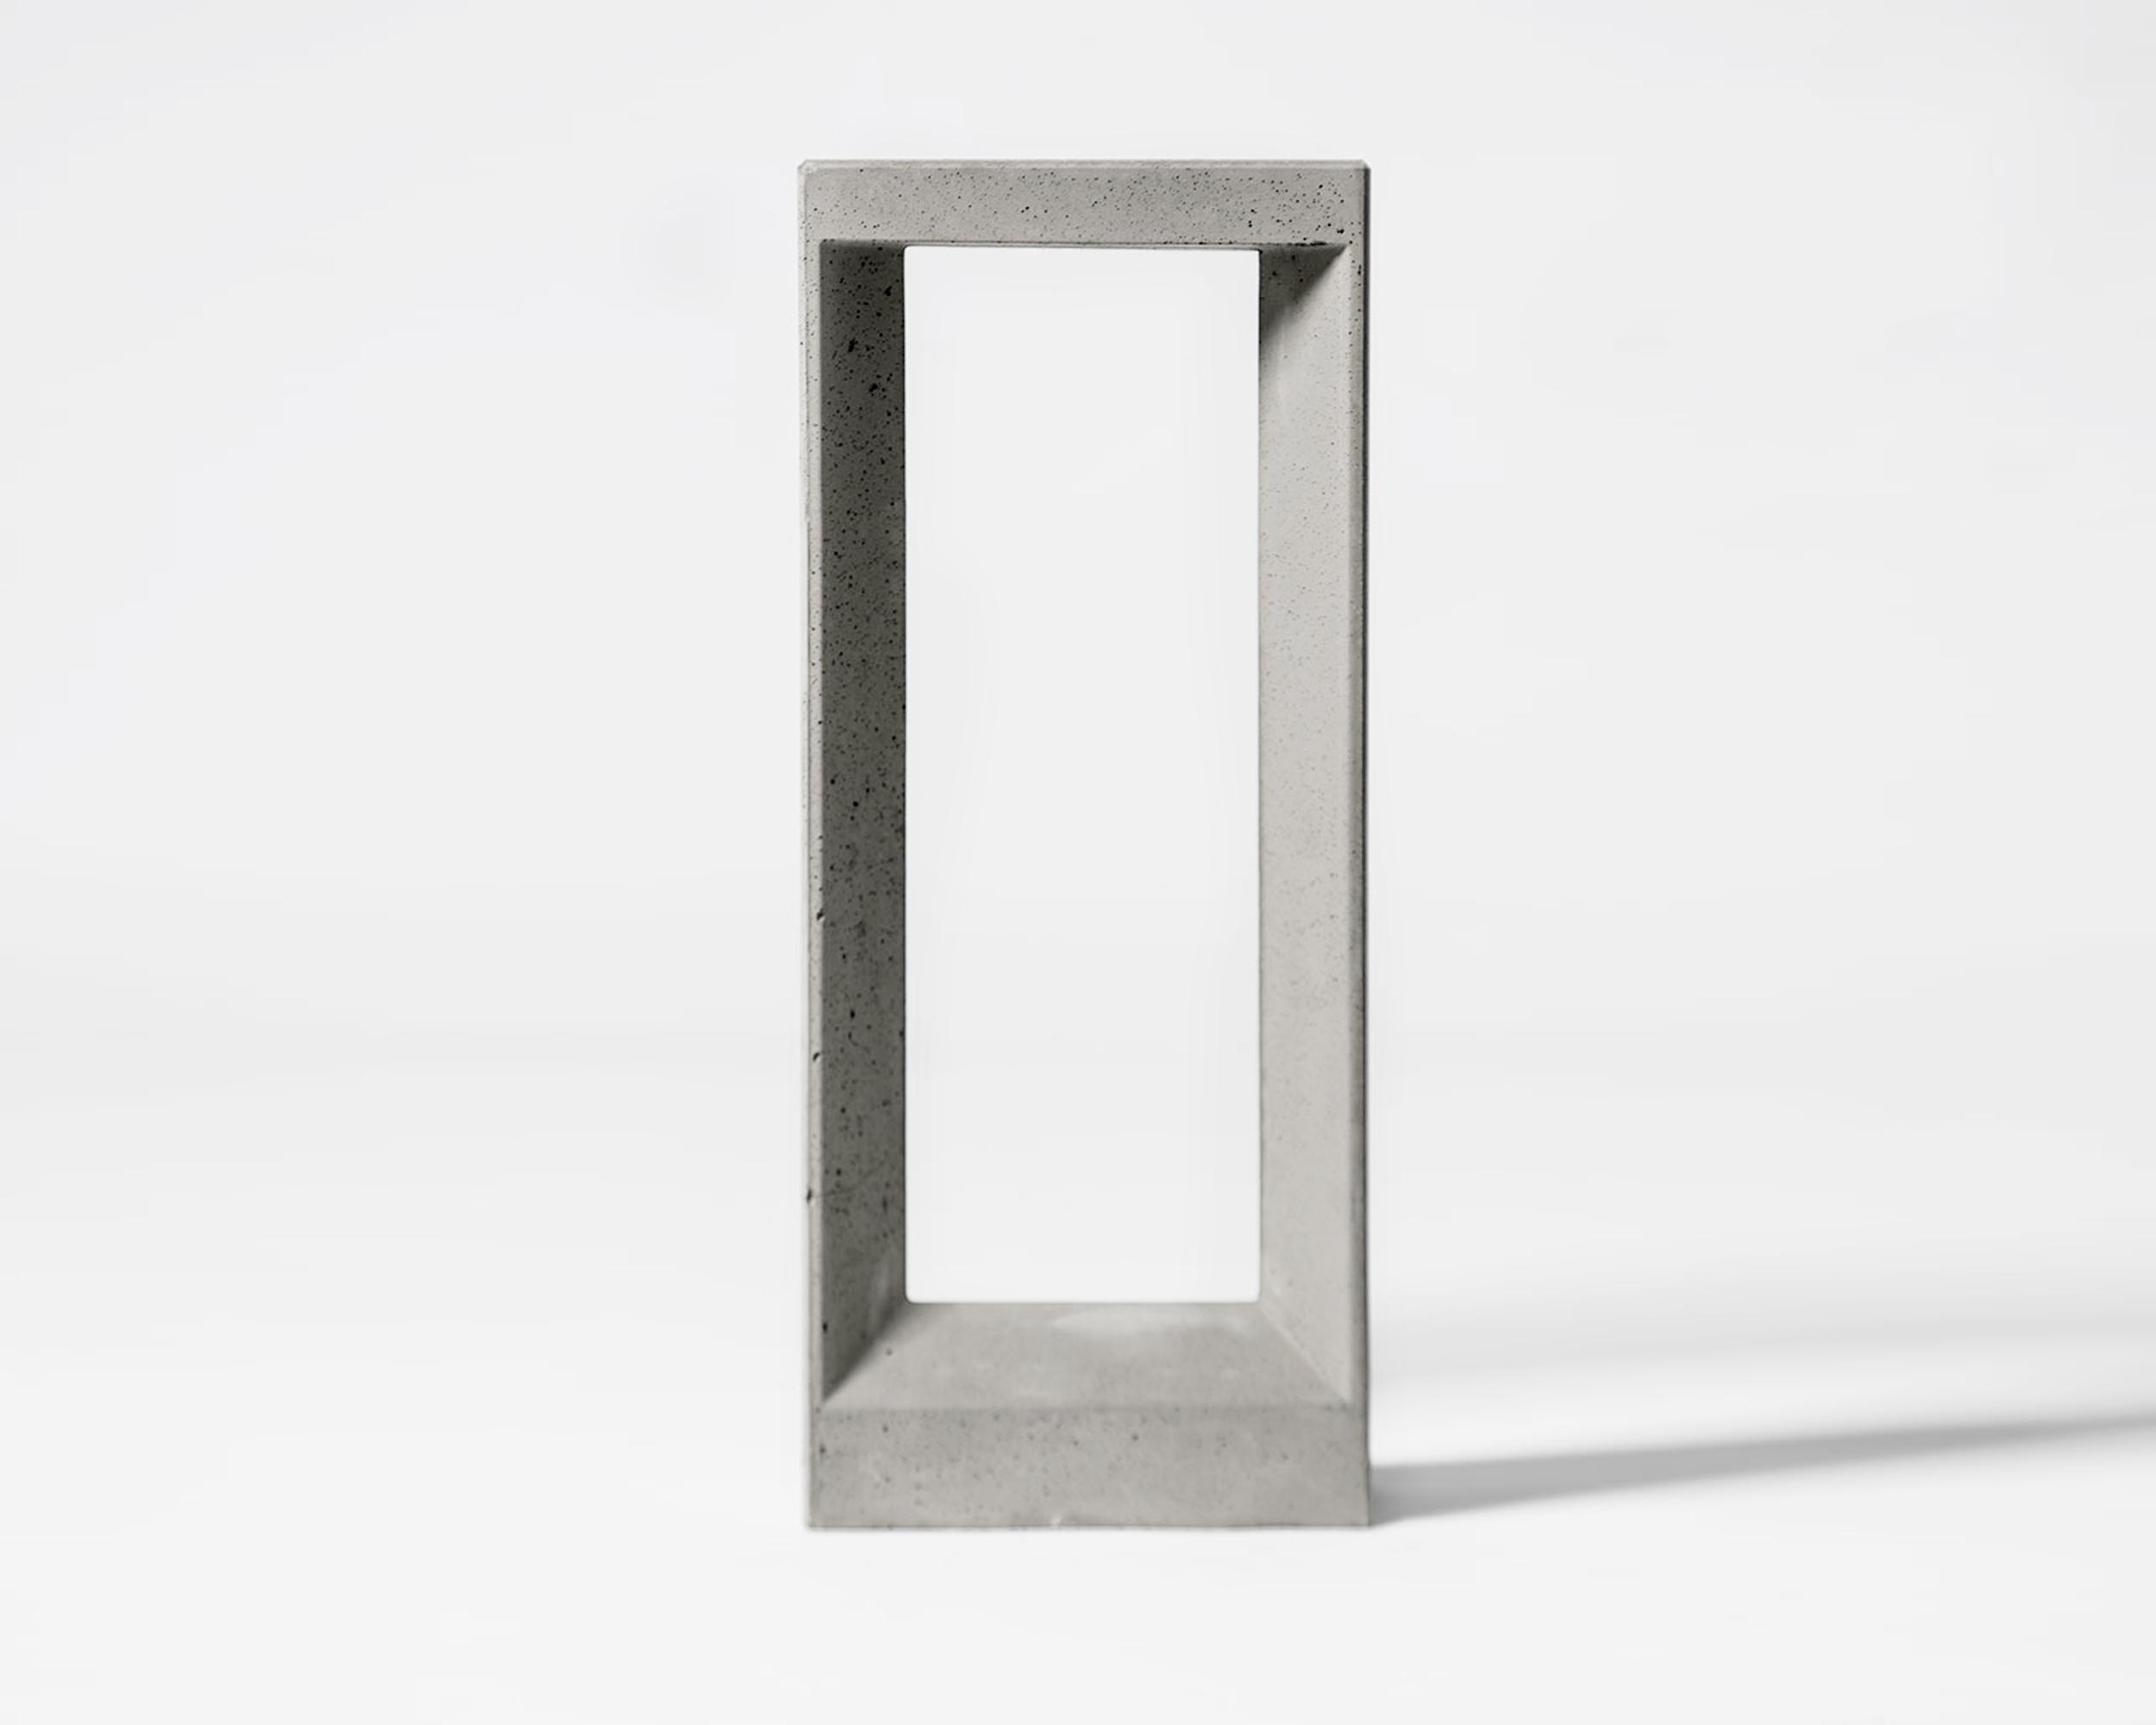 Frame_2_Bentu_Design_Lamp